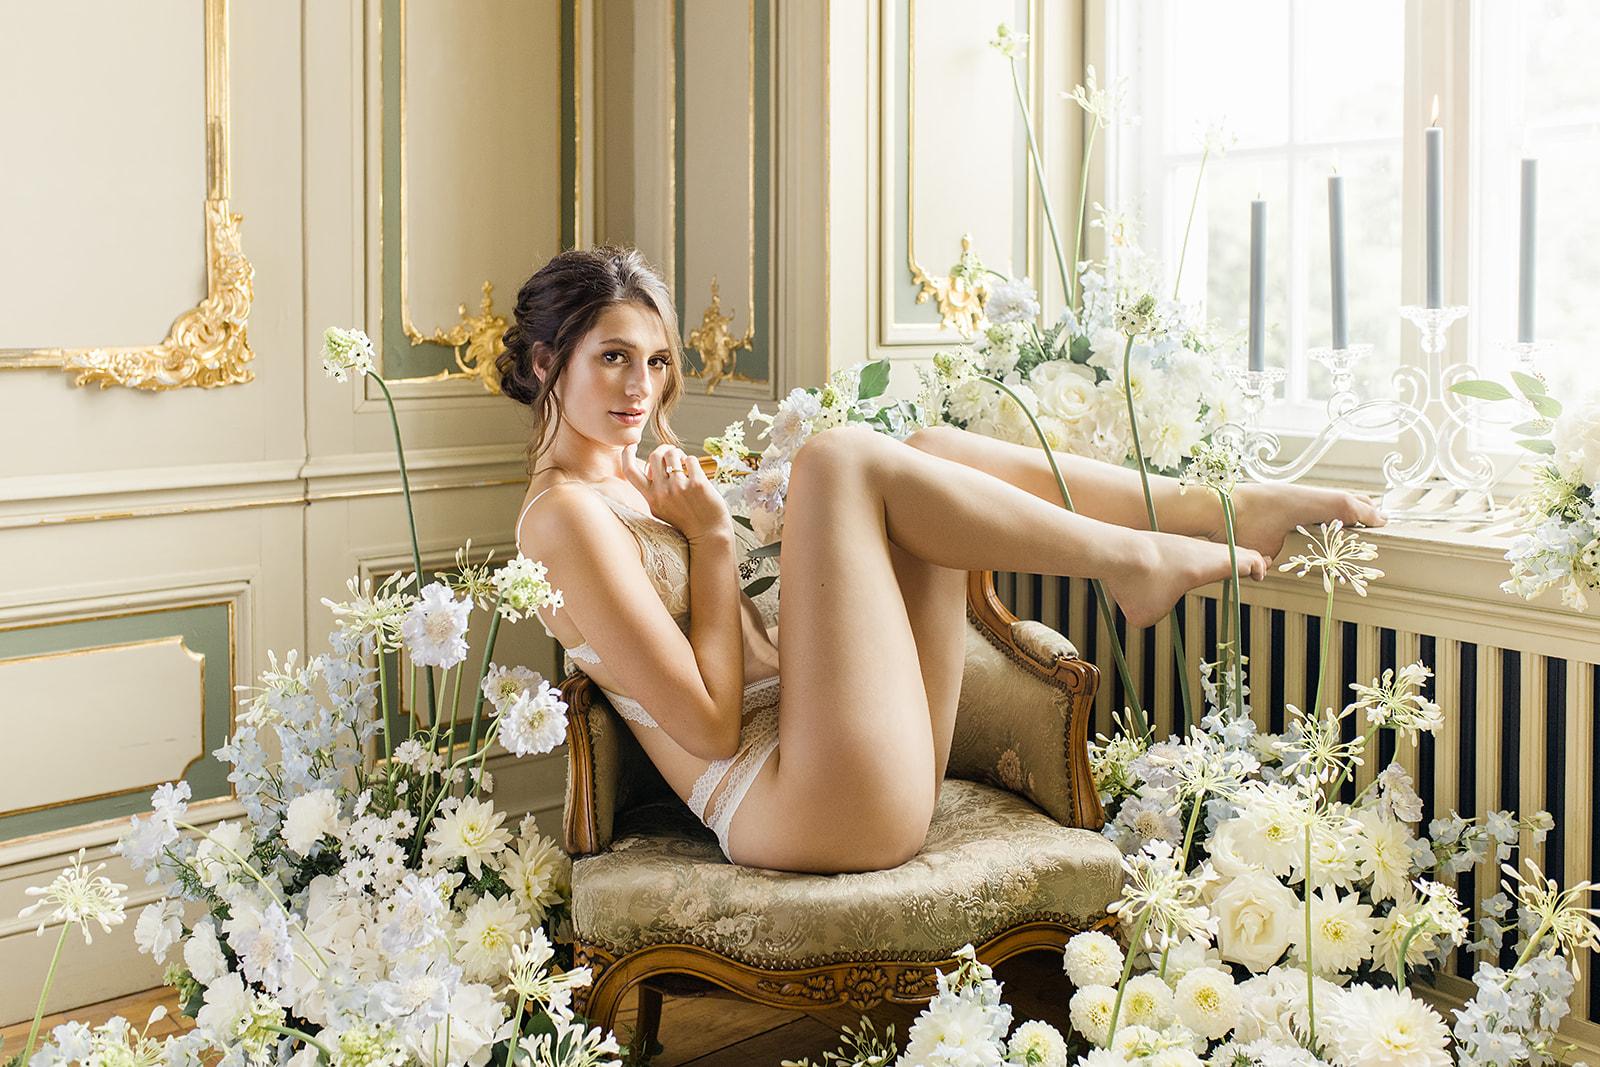 Hochzeitstrends 2021: Bridal Boudoir Shooting